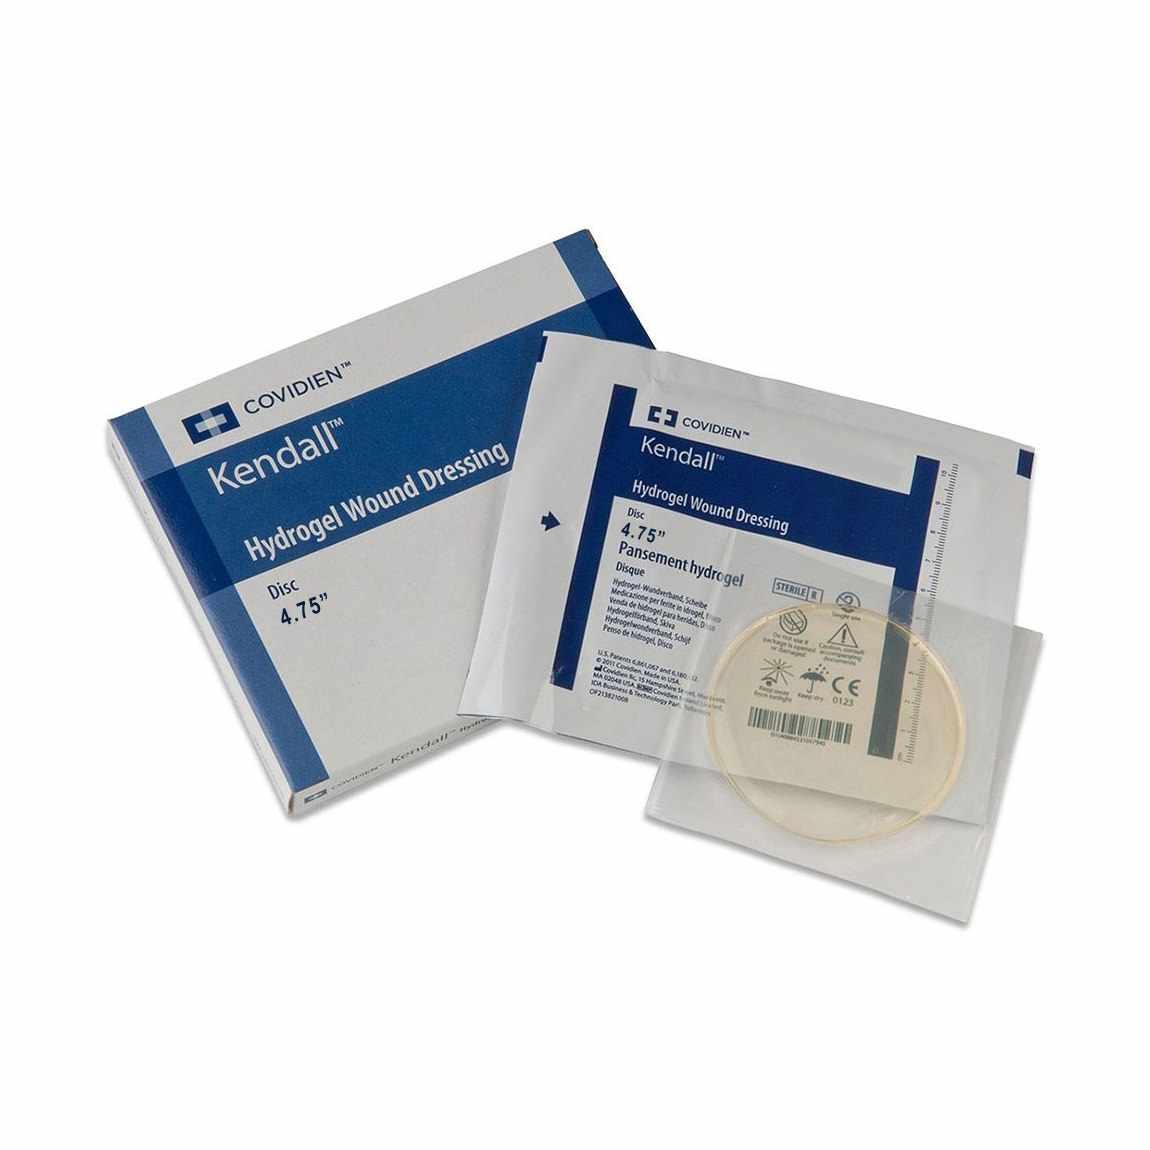 "Covidien dermacea aquaflo hydrogel wound dressing disk 4-3/4"""